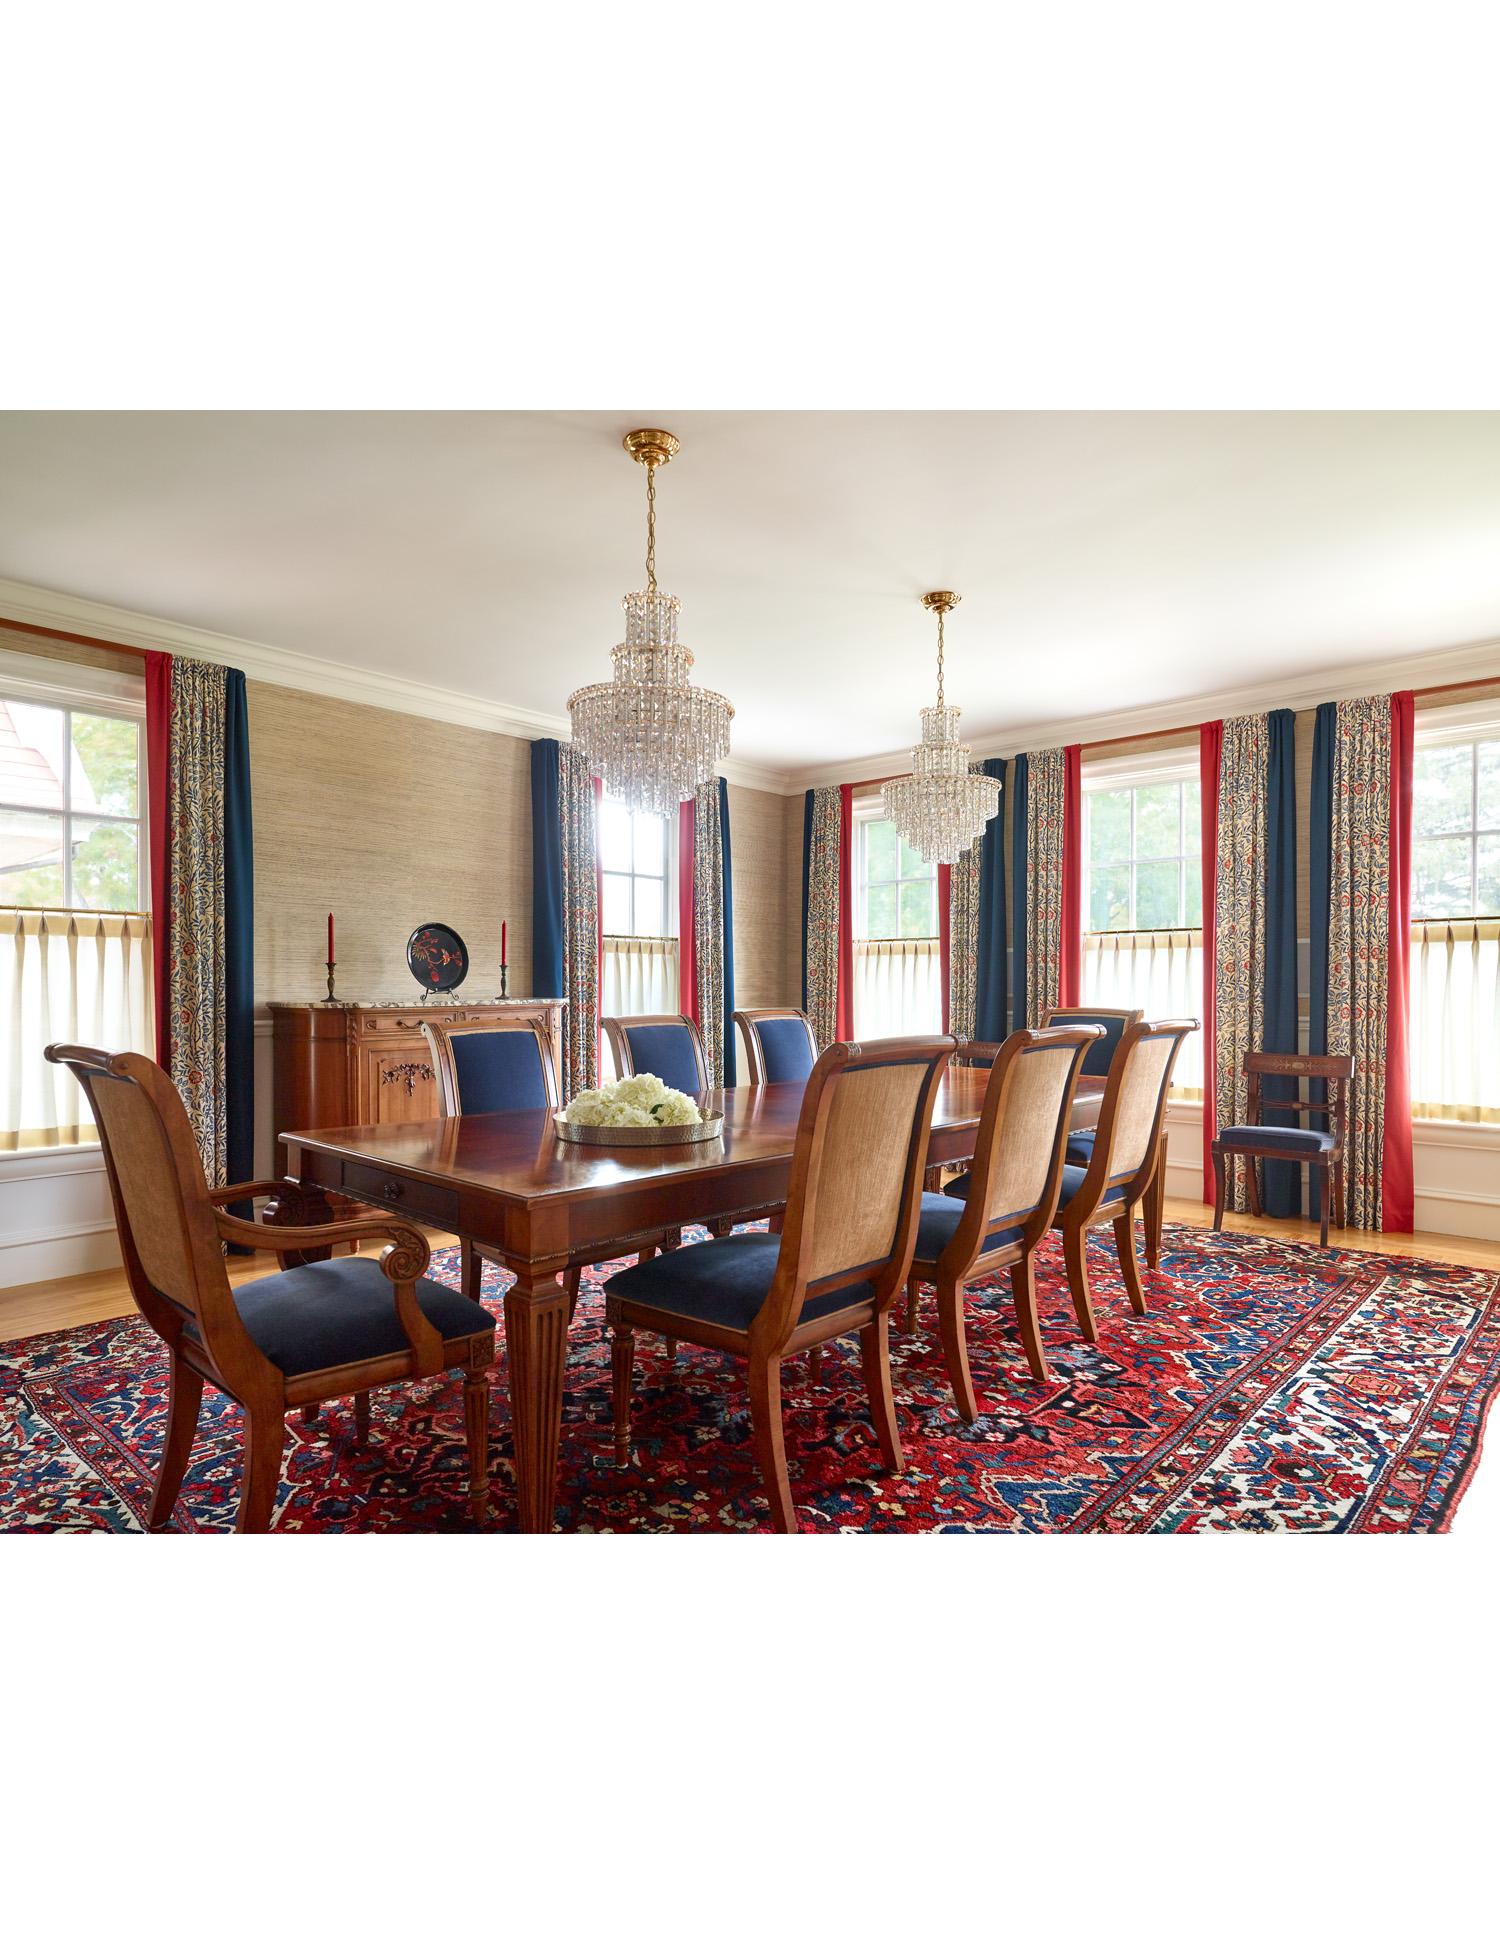 Lexington 11 Dining Room.jpg